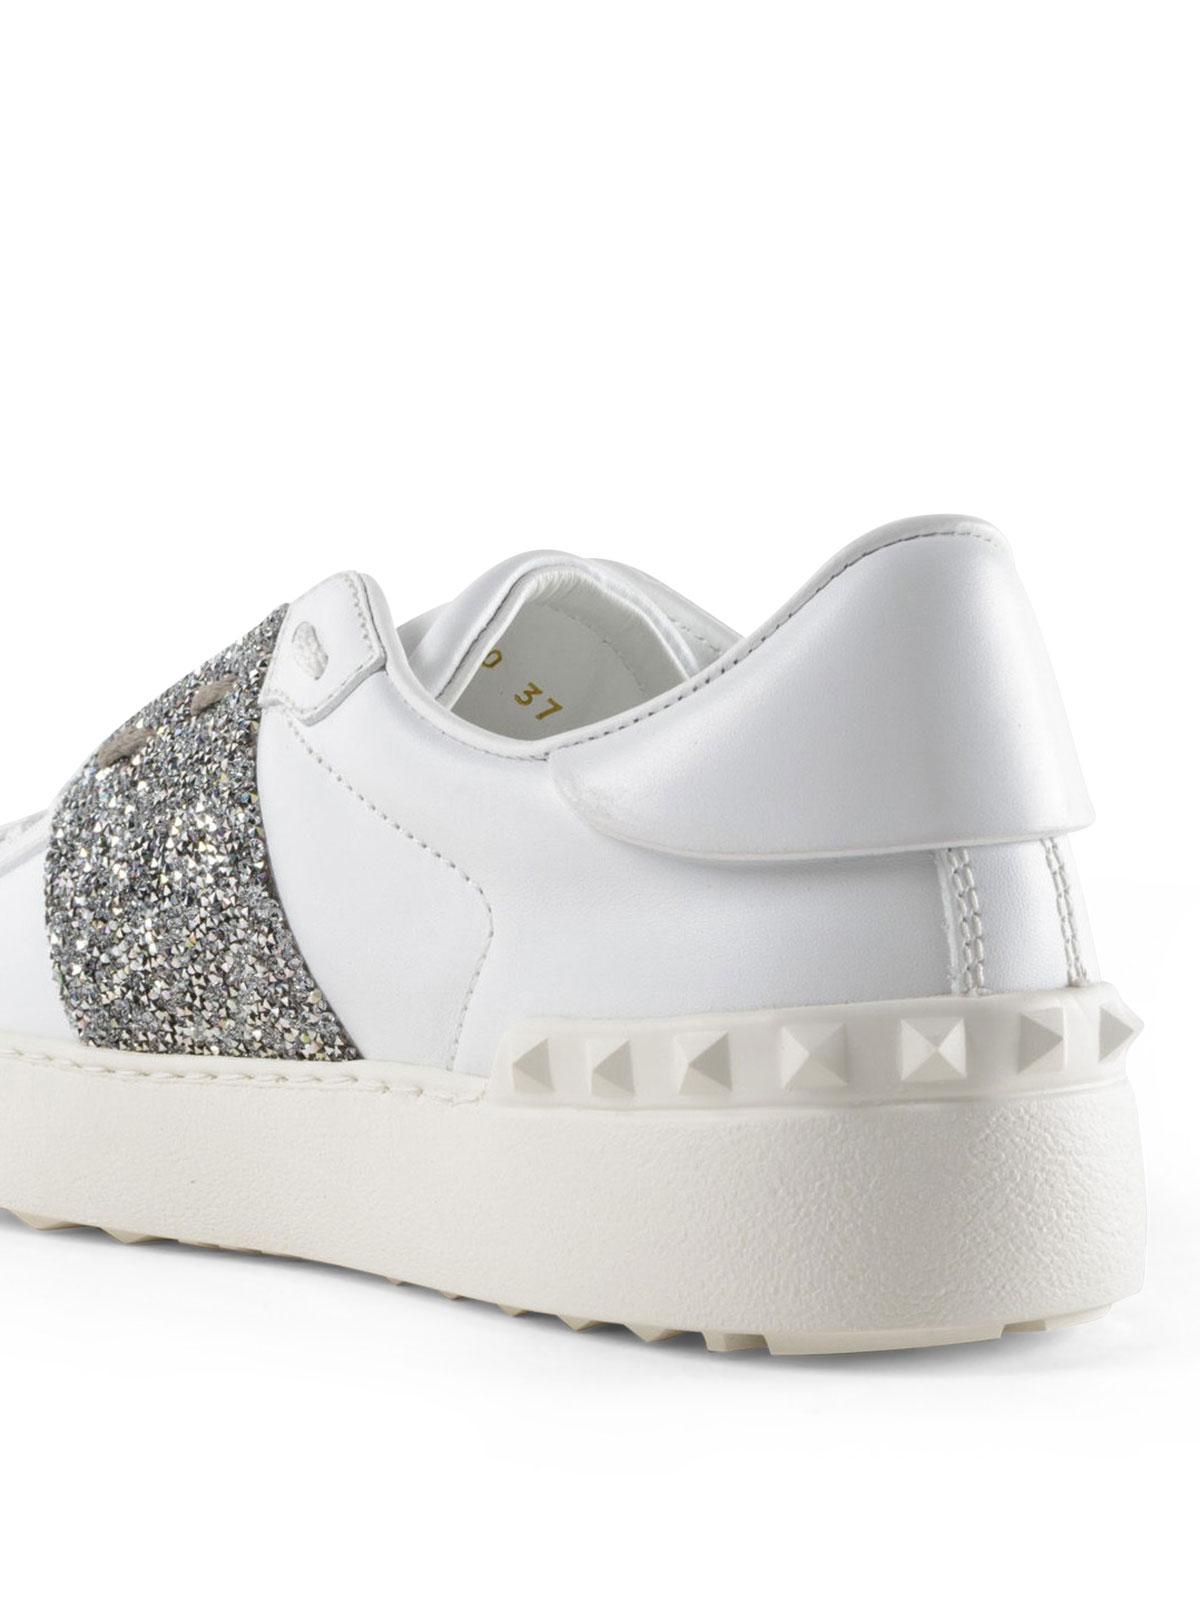 iKRIX VALENTINO GARAVANI  sneakers - Sneaker Open con banda glitter argento 3ea2624aa1a